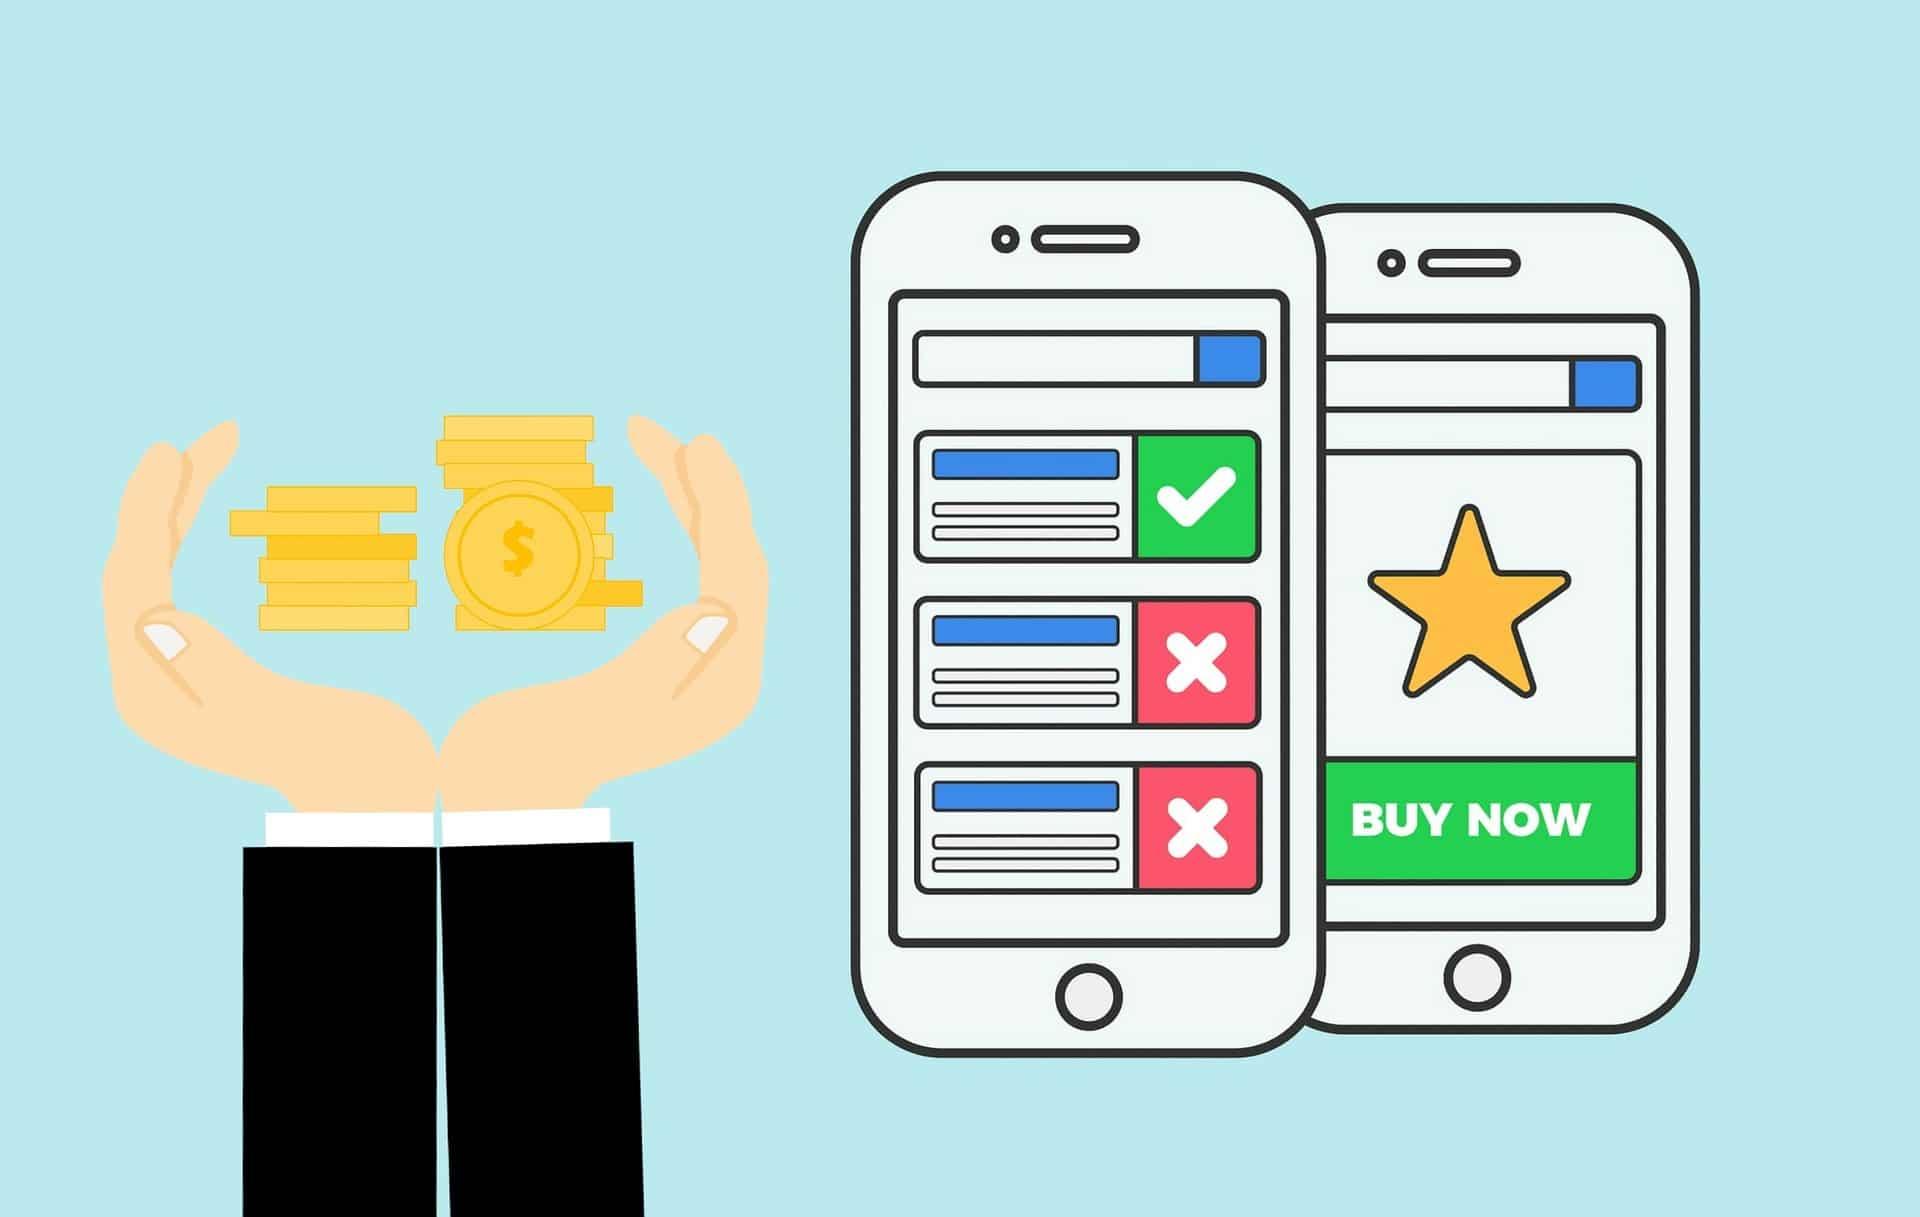 Oglašavanje na Facebooku i Instagramu je trenutno najpopularnija vrsta promocije